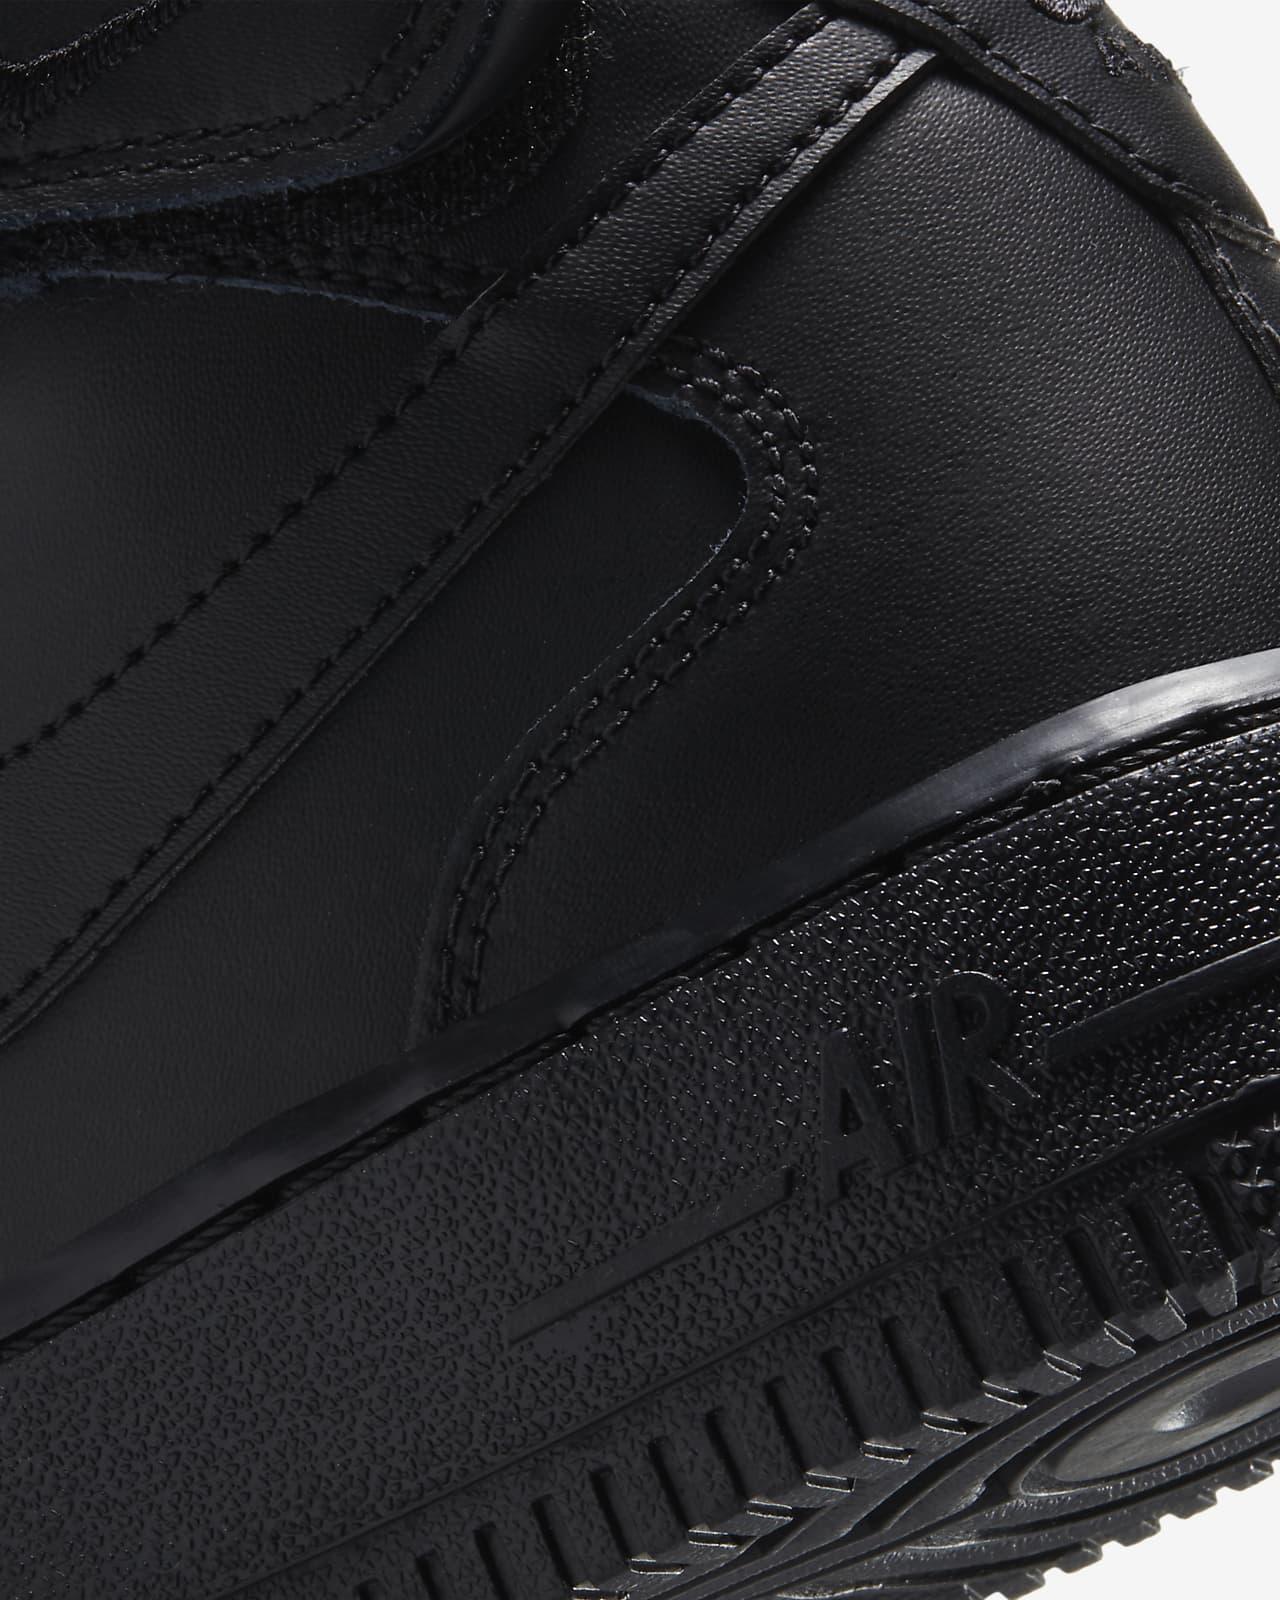 Chaussure Nike Air Force 1 06 mi-montante pour Garçon